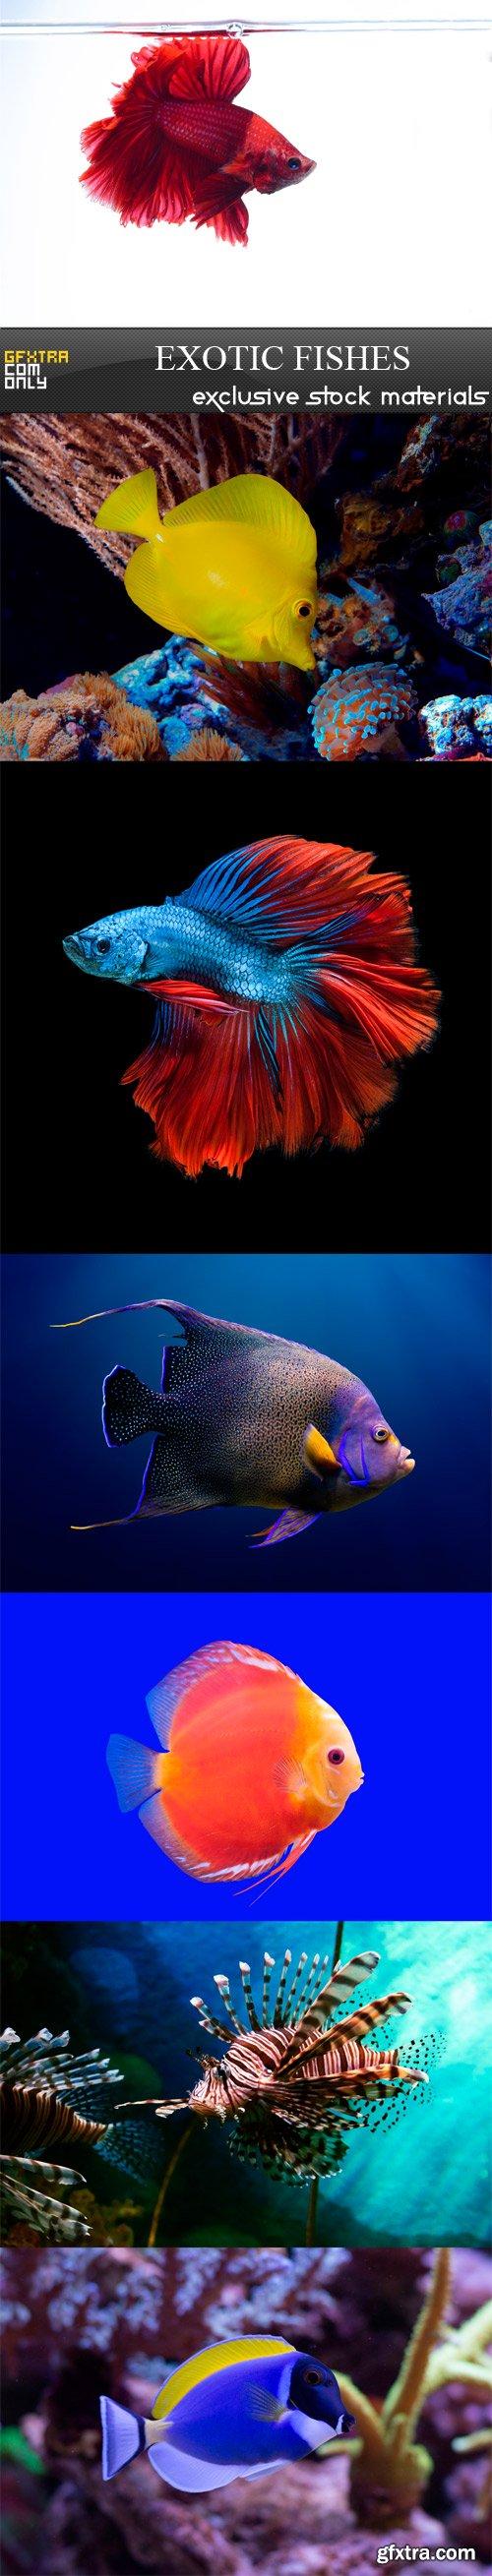 Exotic fishes - 7 UHQ JPEG